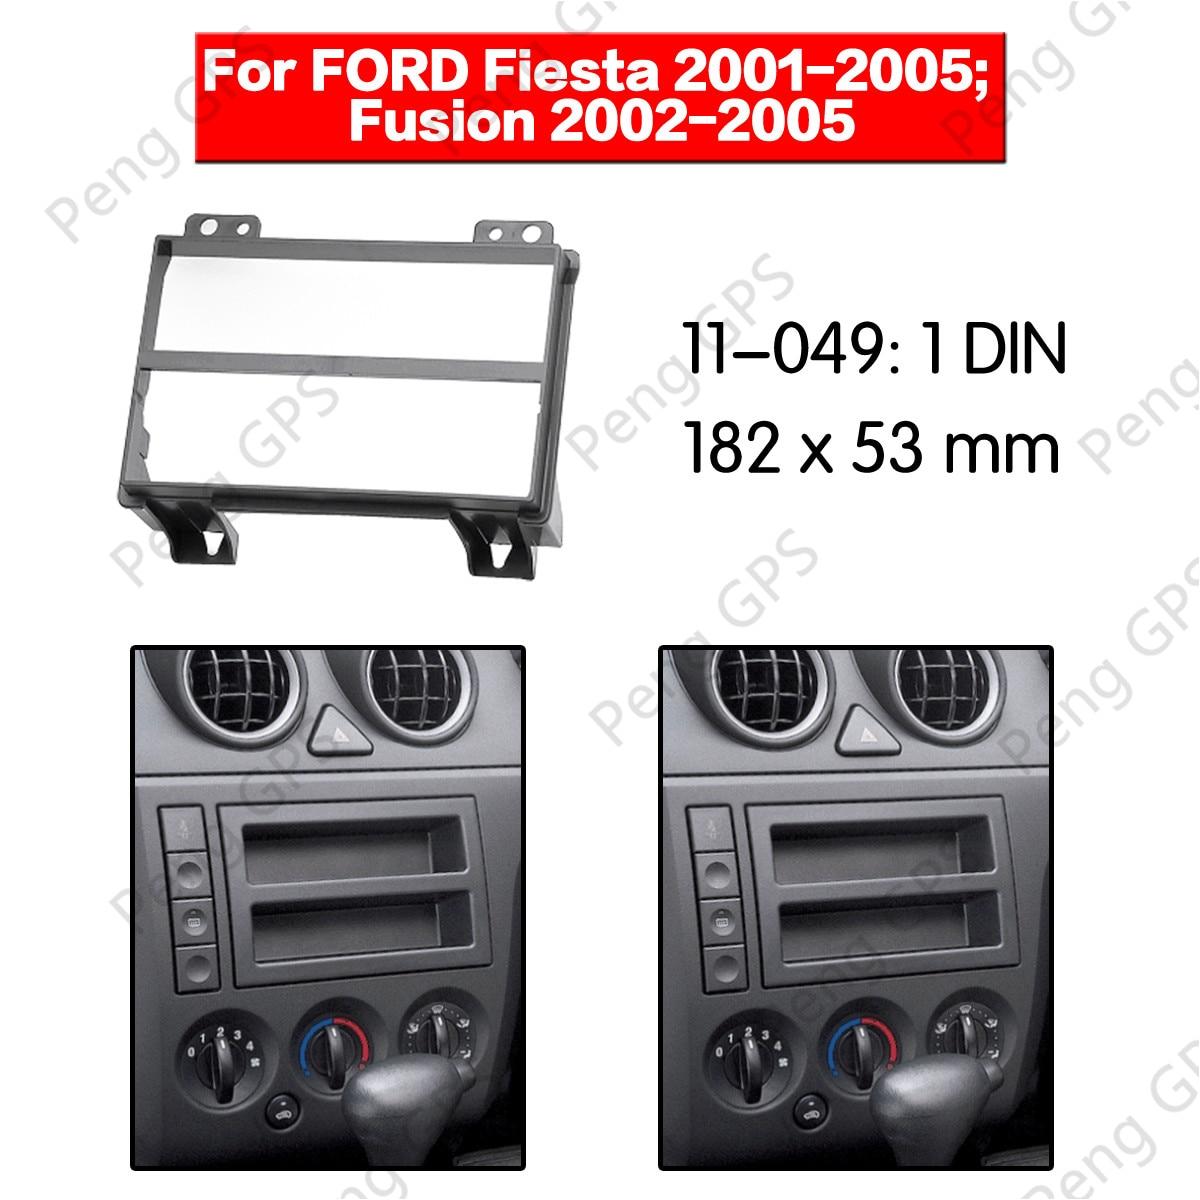 Marco de placa para coche 1DIN fascia facia, panel de placa para FORD Fusion Fiesta 2001-2005 Stereo Fascia Dash Kit de instalación de moldura de CD 11-049